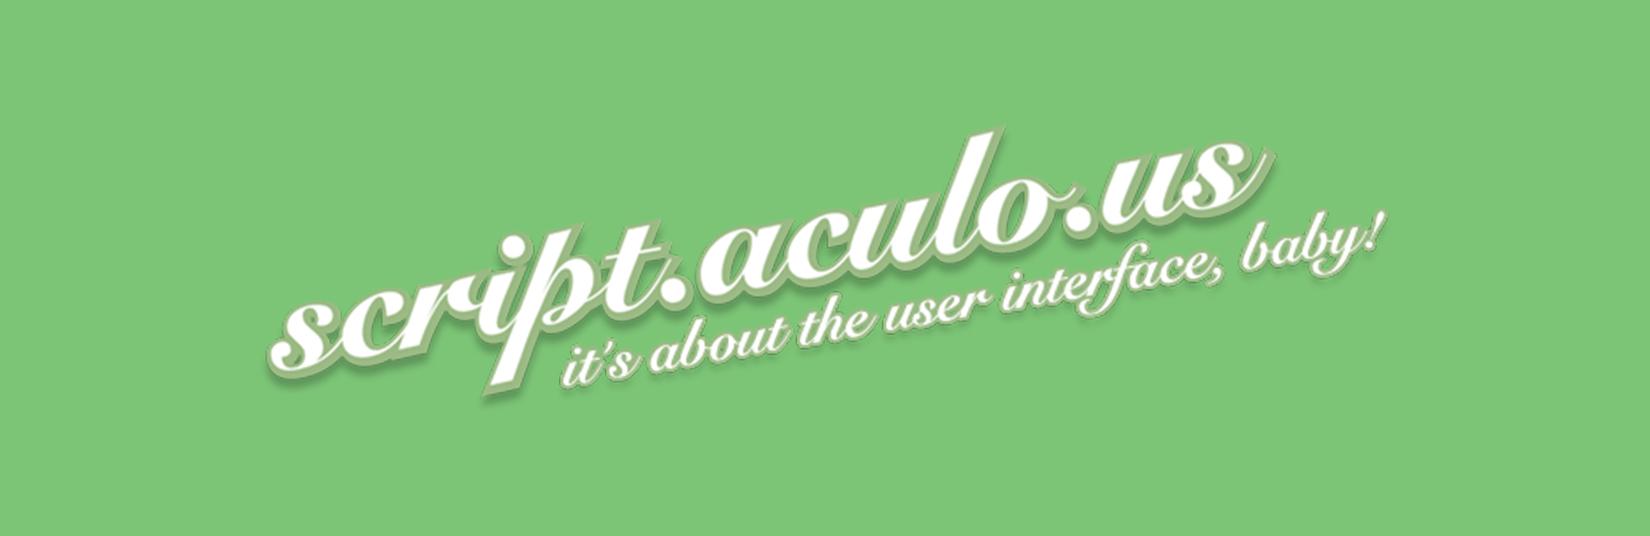 Script.aculo.us_Development_Service